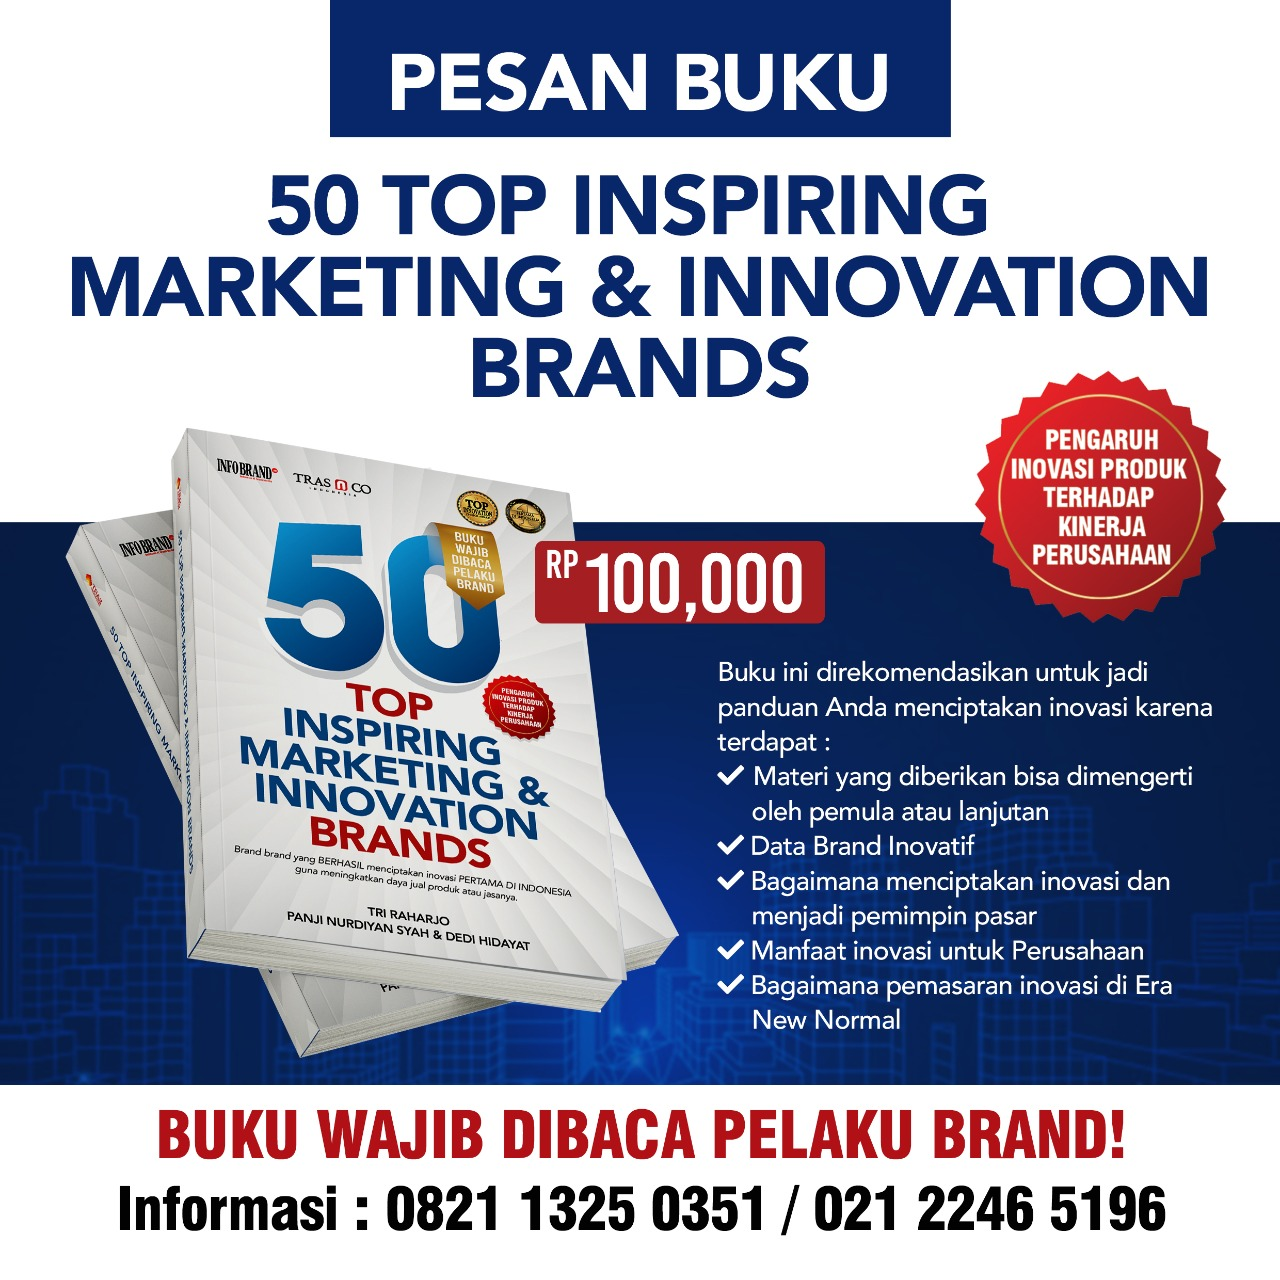 Buku 50 TOP INSPIRING MARKETING & INNOVATION BRANDS